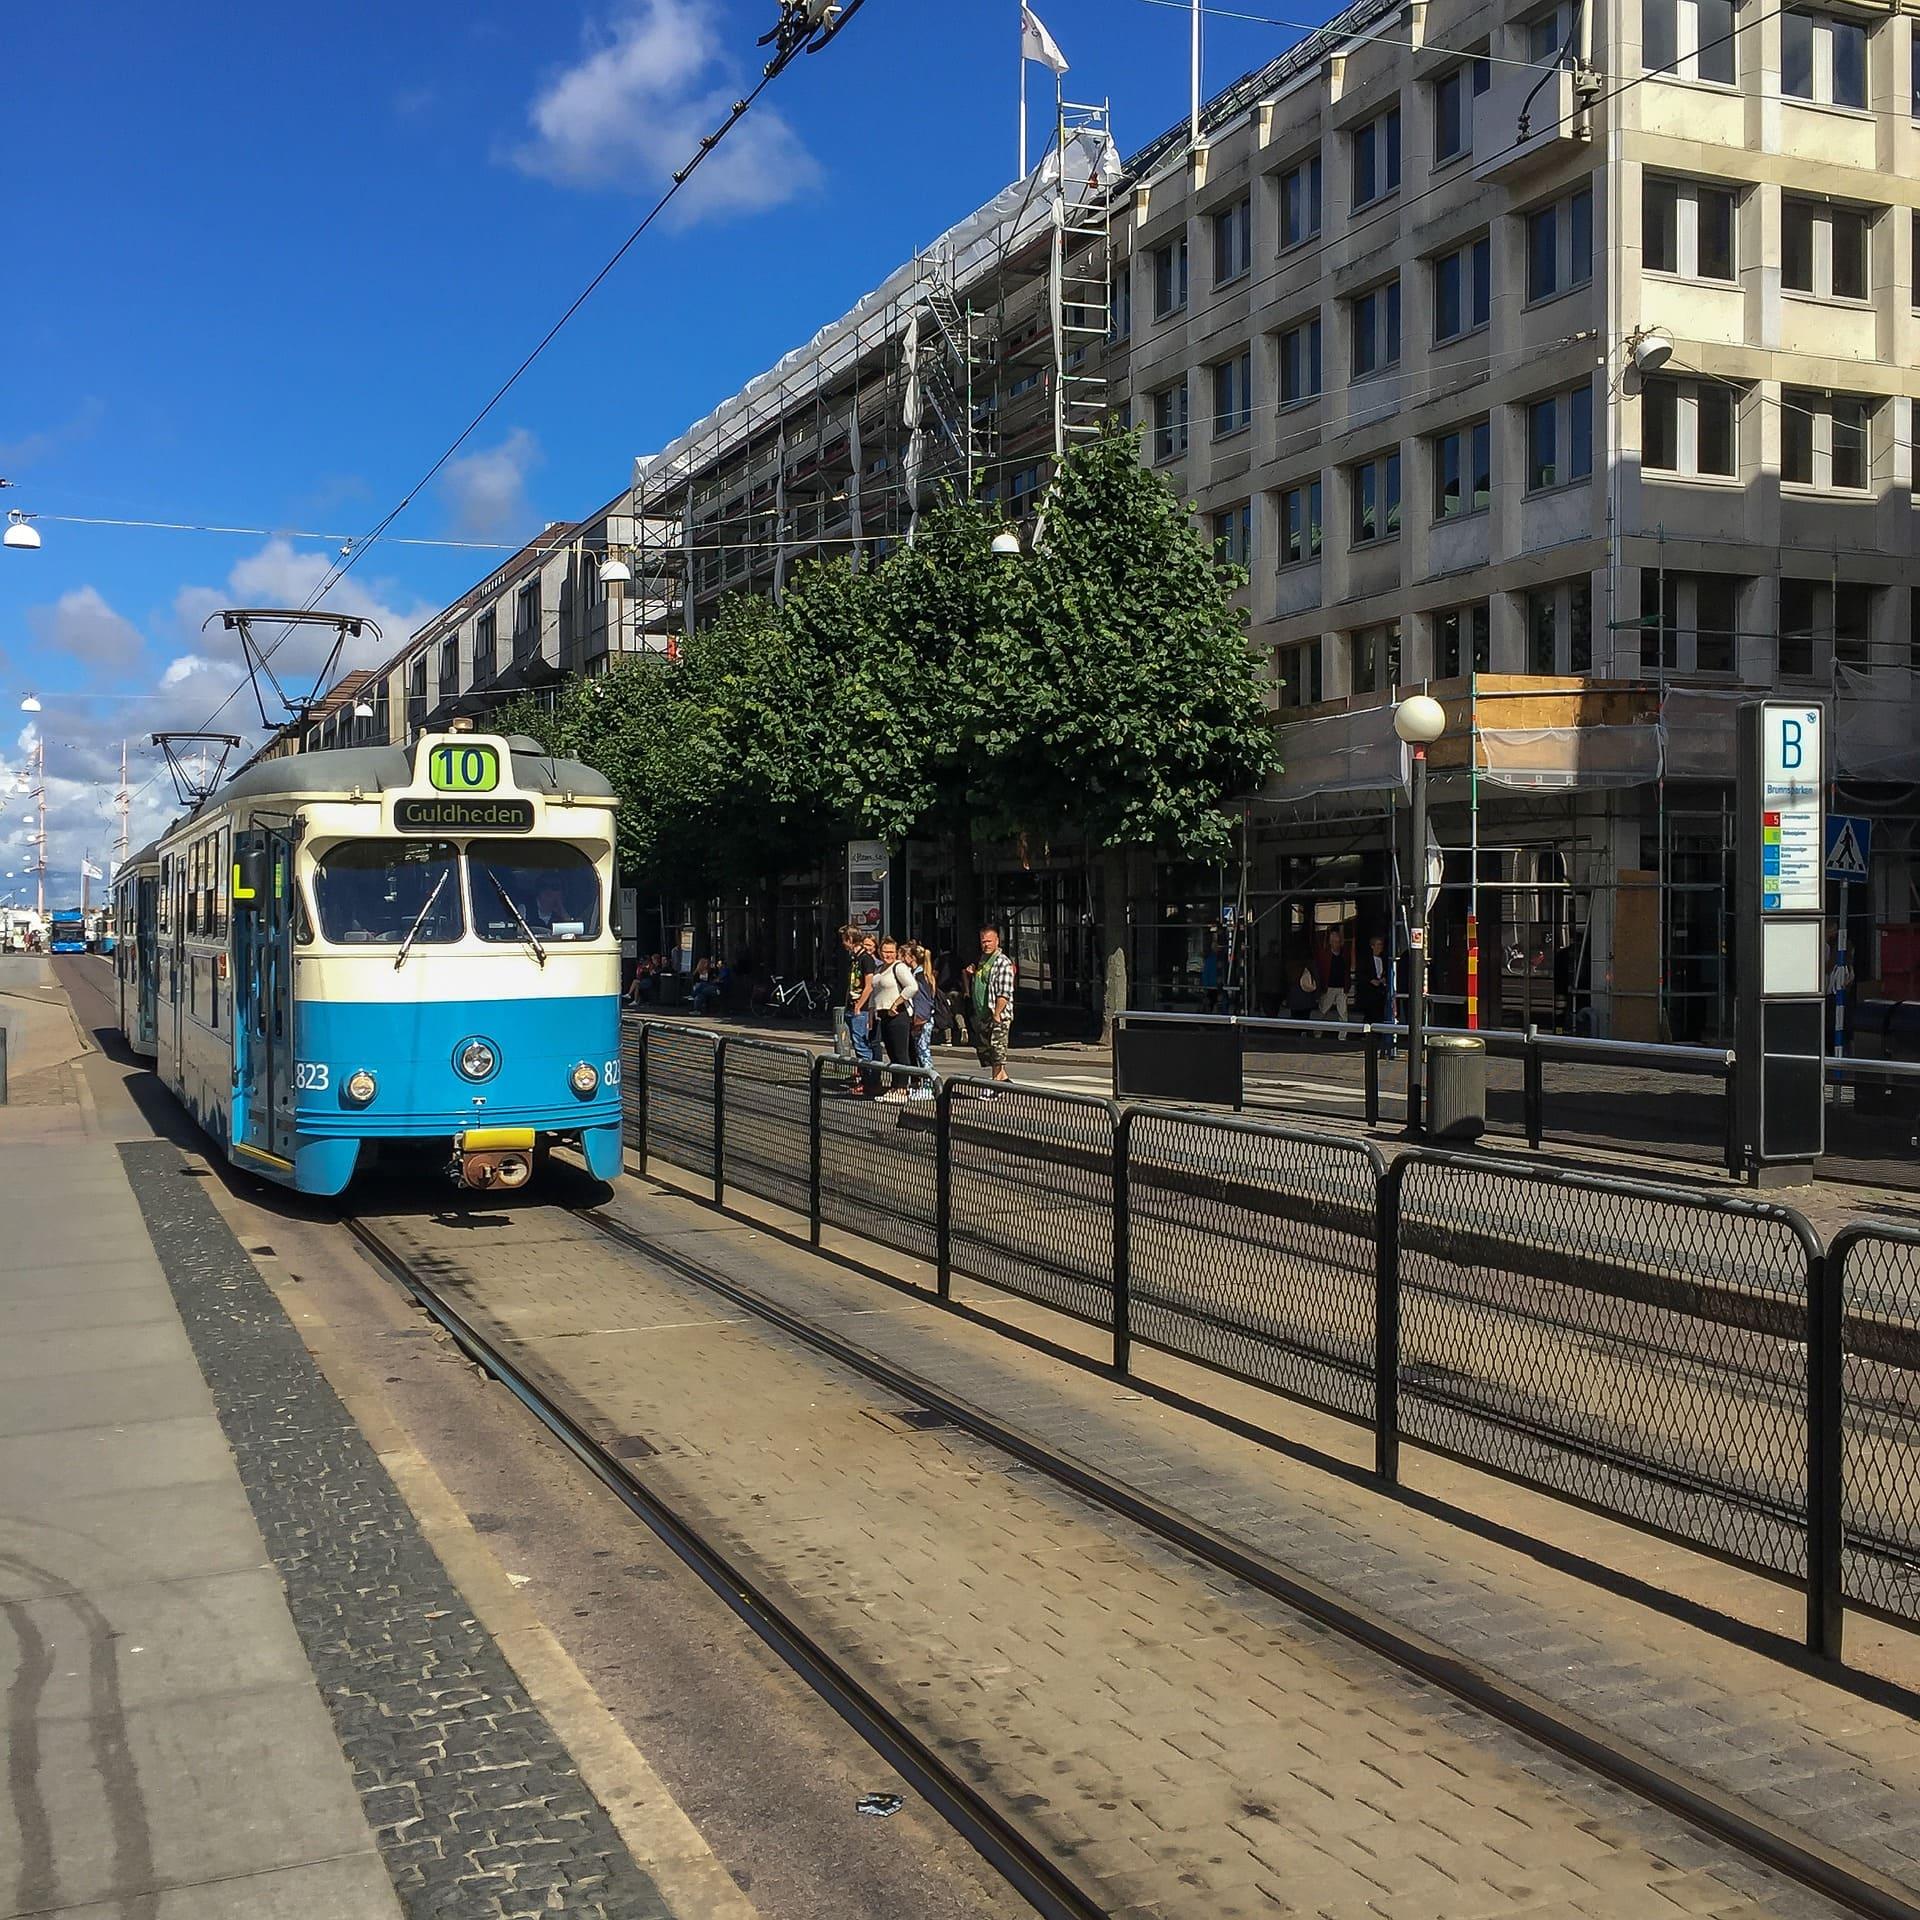 Spårvagn på gata i Göteborg